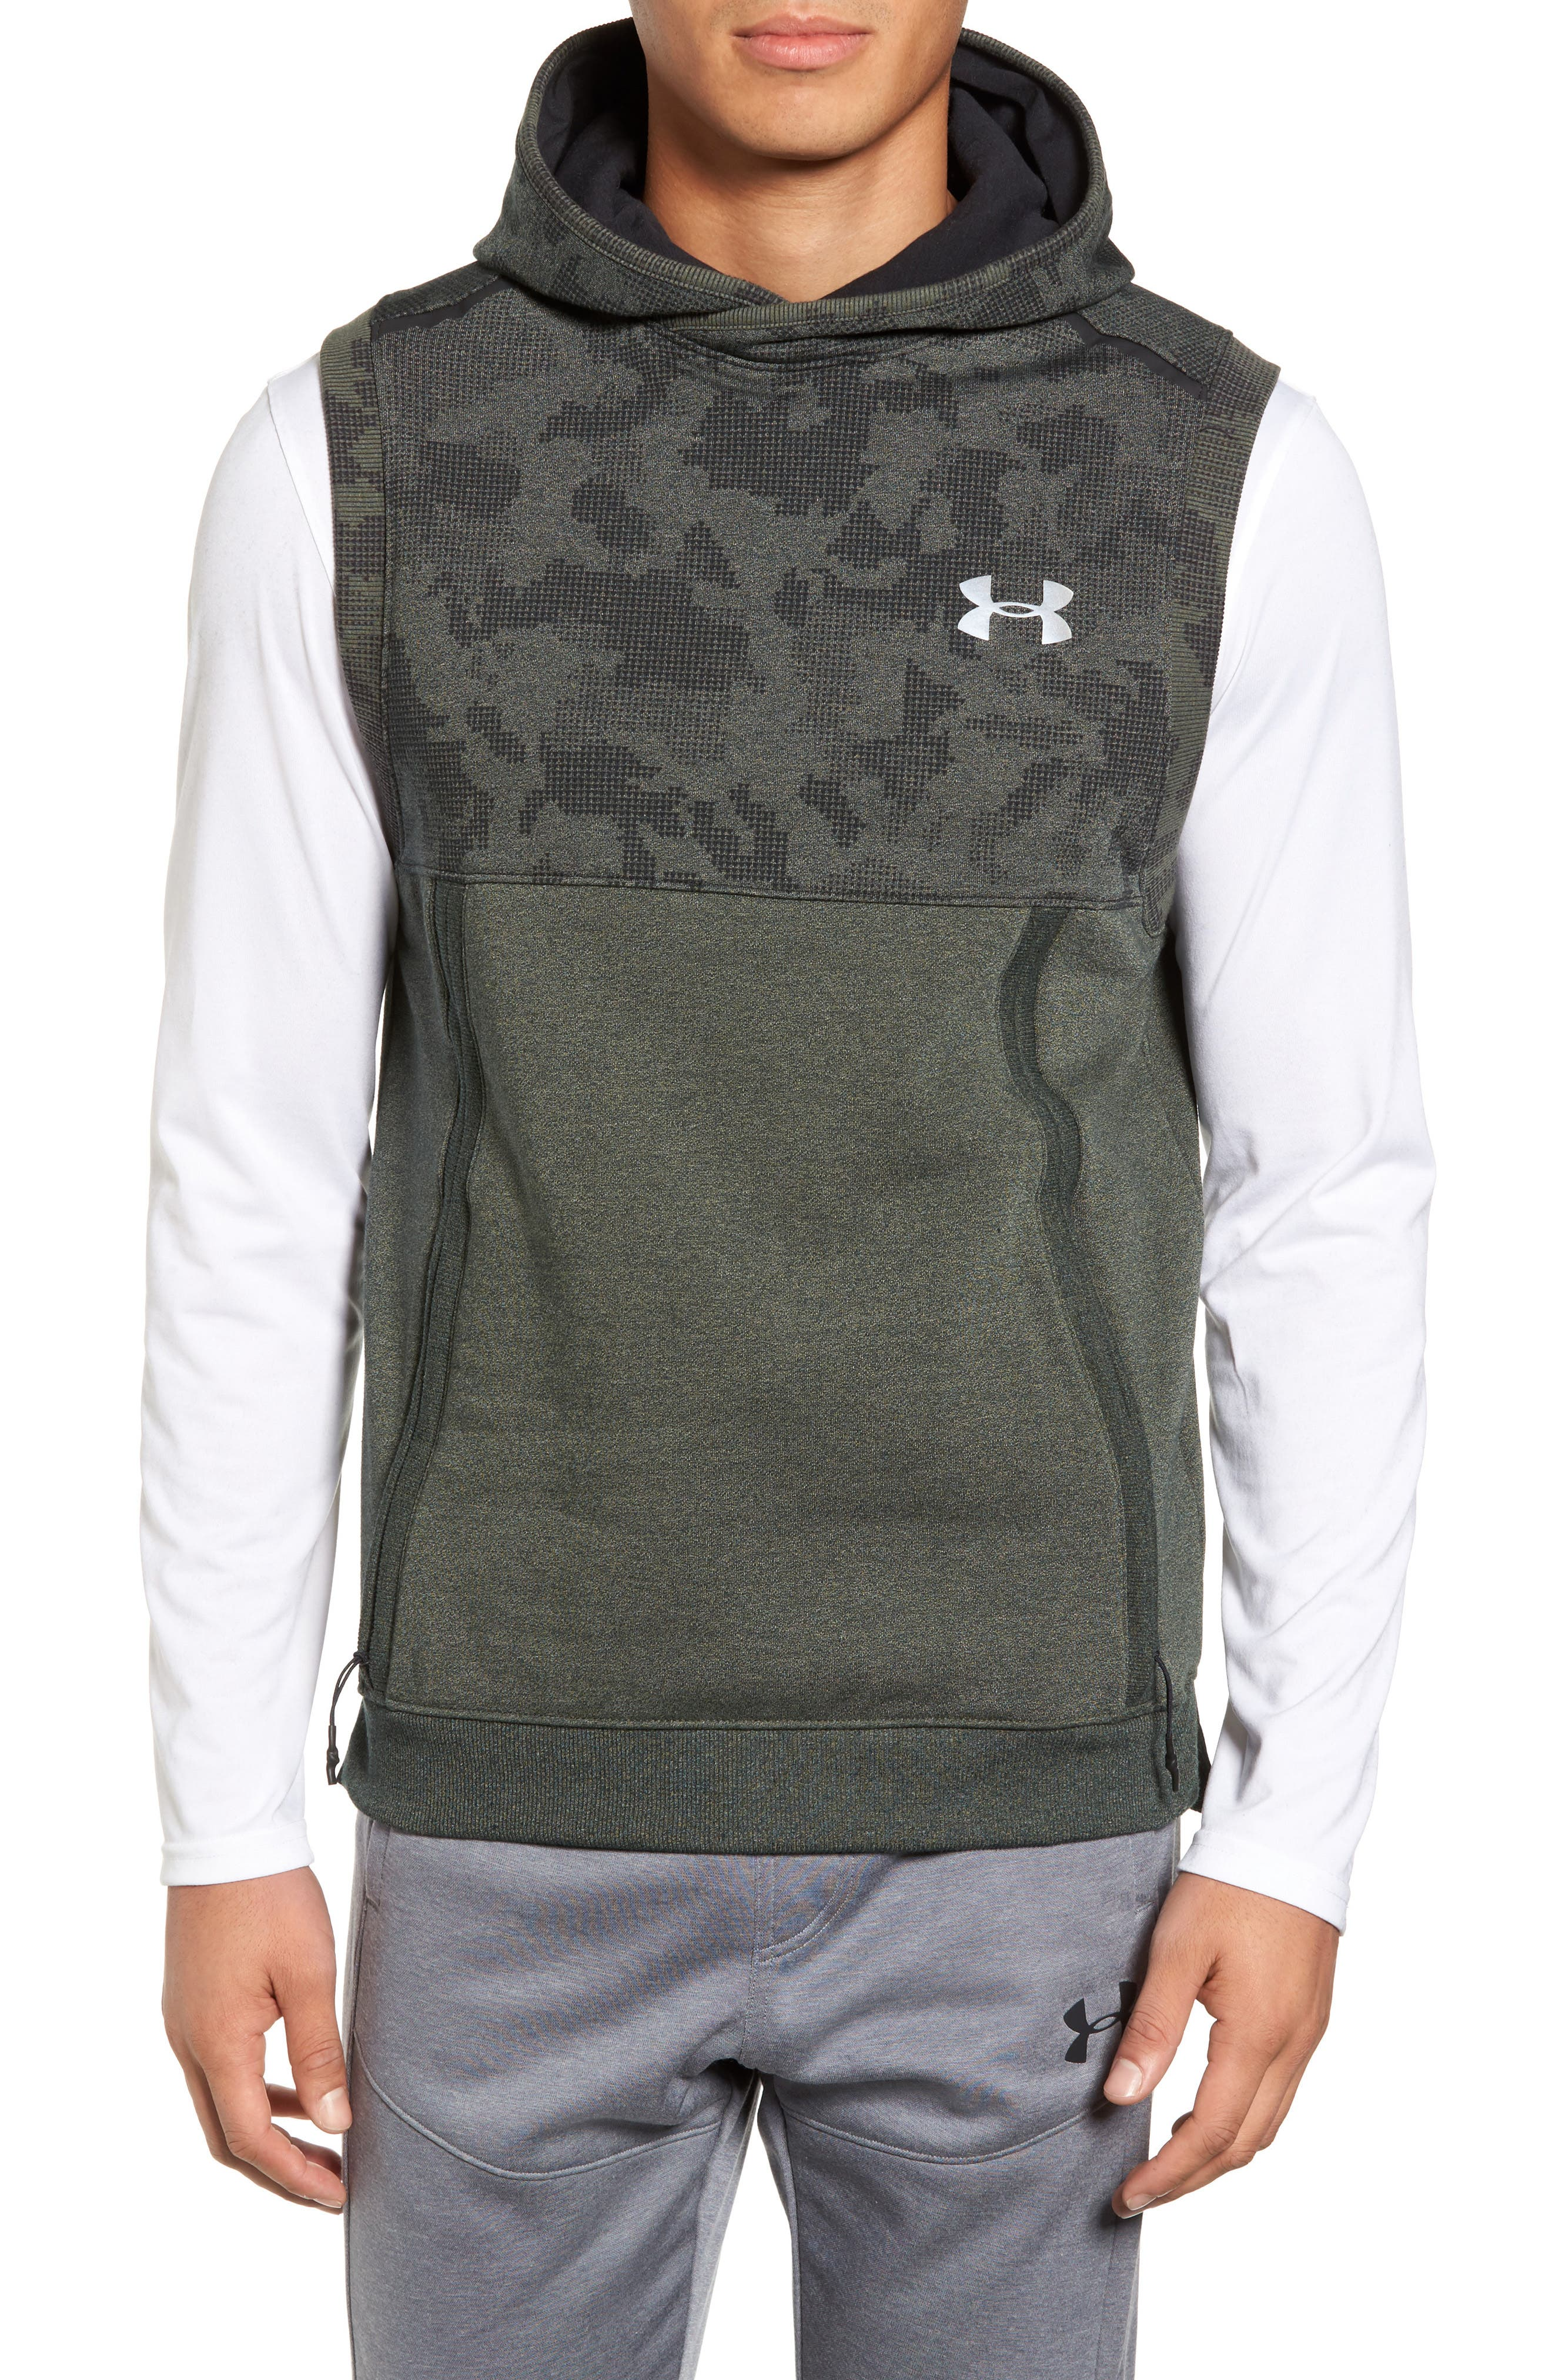 Threadborne Hooded Vest,                             Main thumbnail 1, color,                             Downtown Green / Refletive